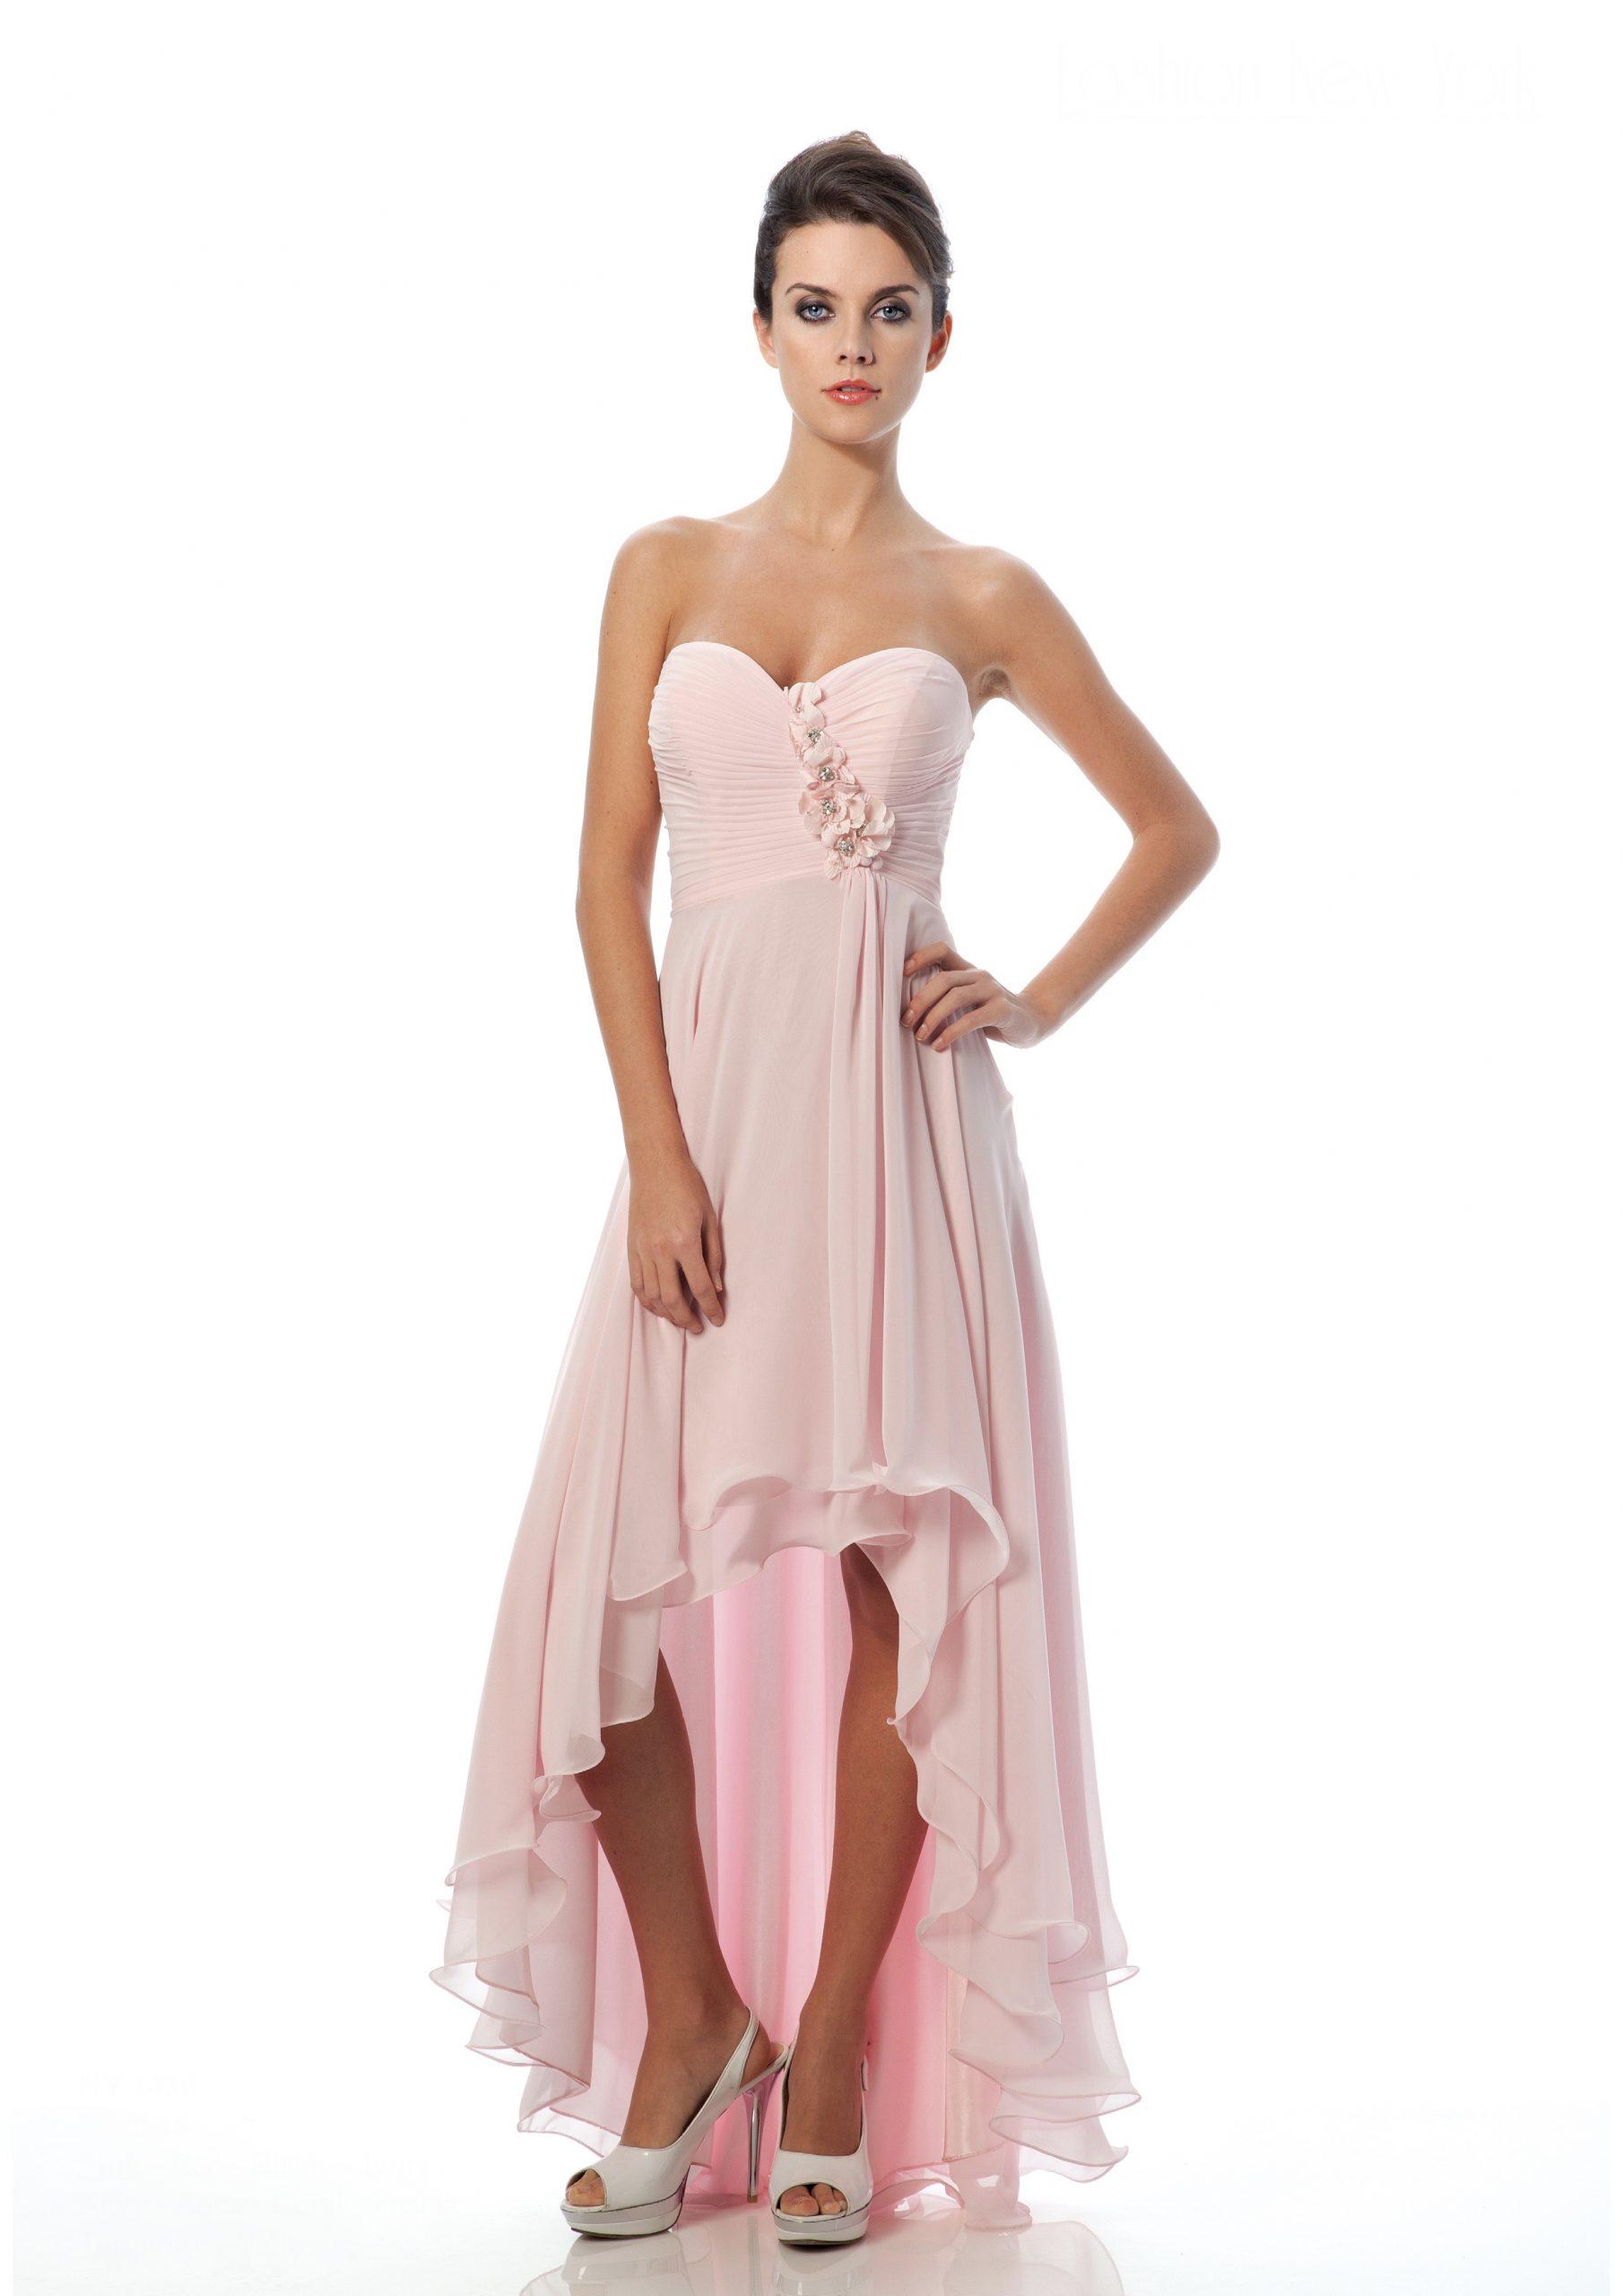 Cool Abendkleid Vokuhila GalerieDesigner Großartig Abendkleid Vokuhila Vertrieb